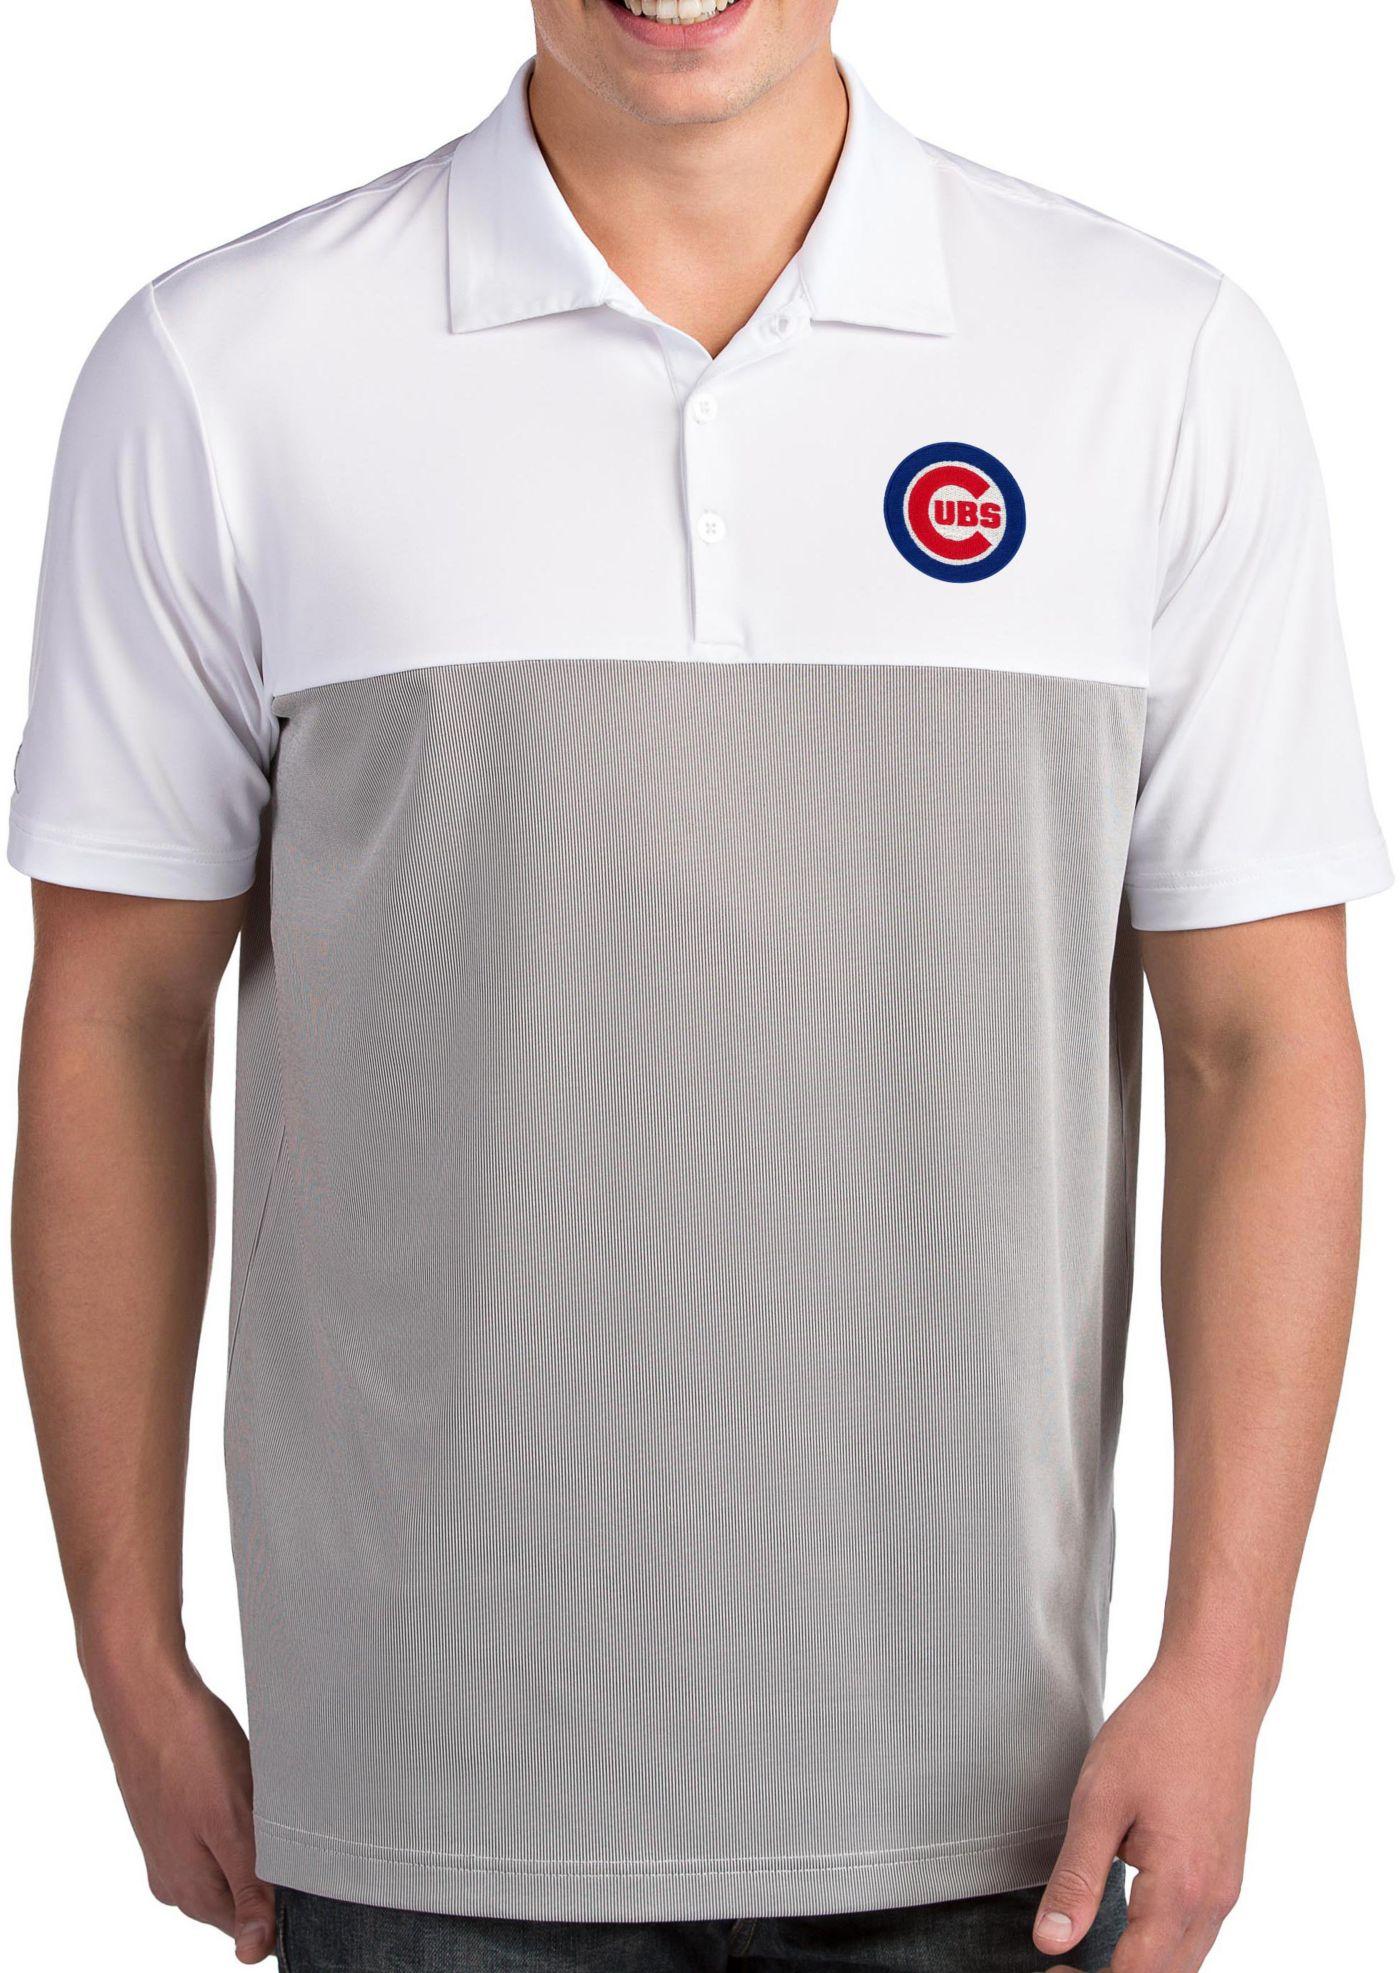 Antigua Men's Chicago Cubs Venture White Performance Polo